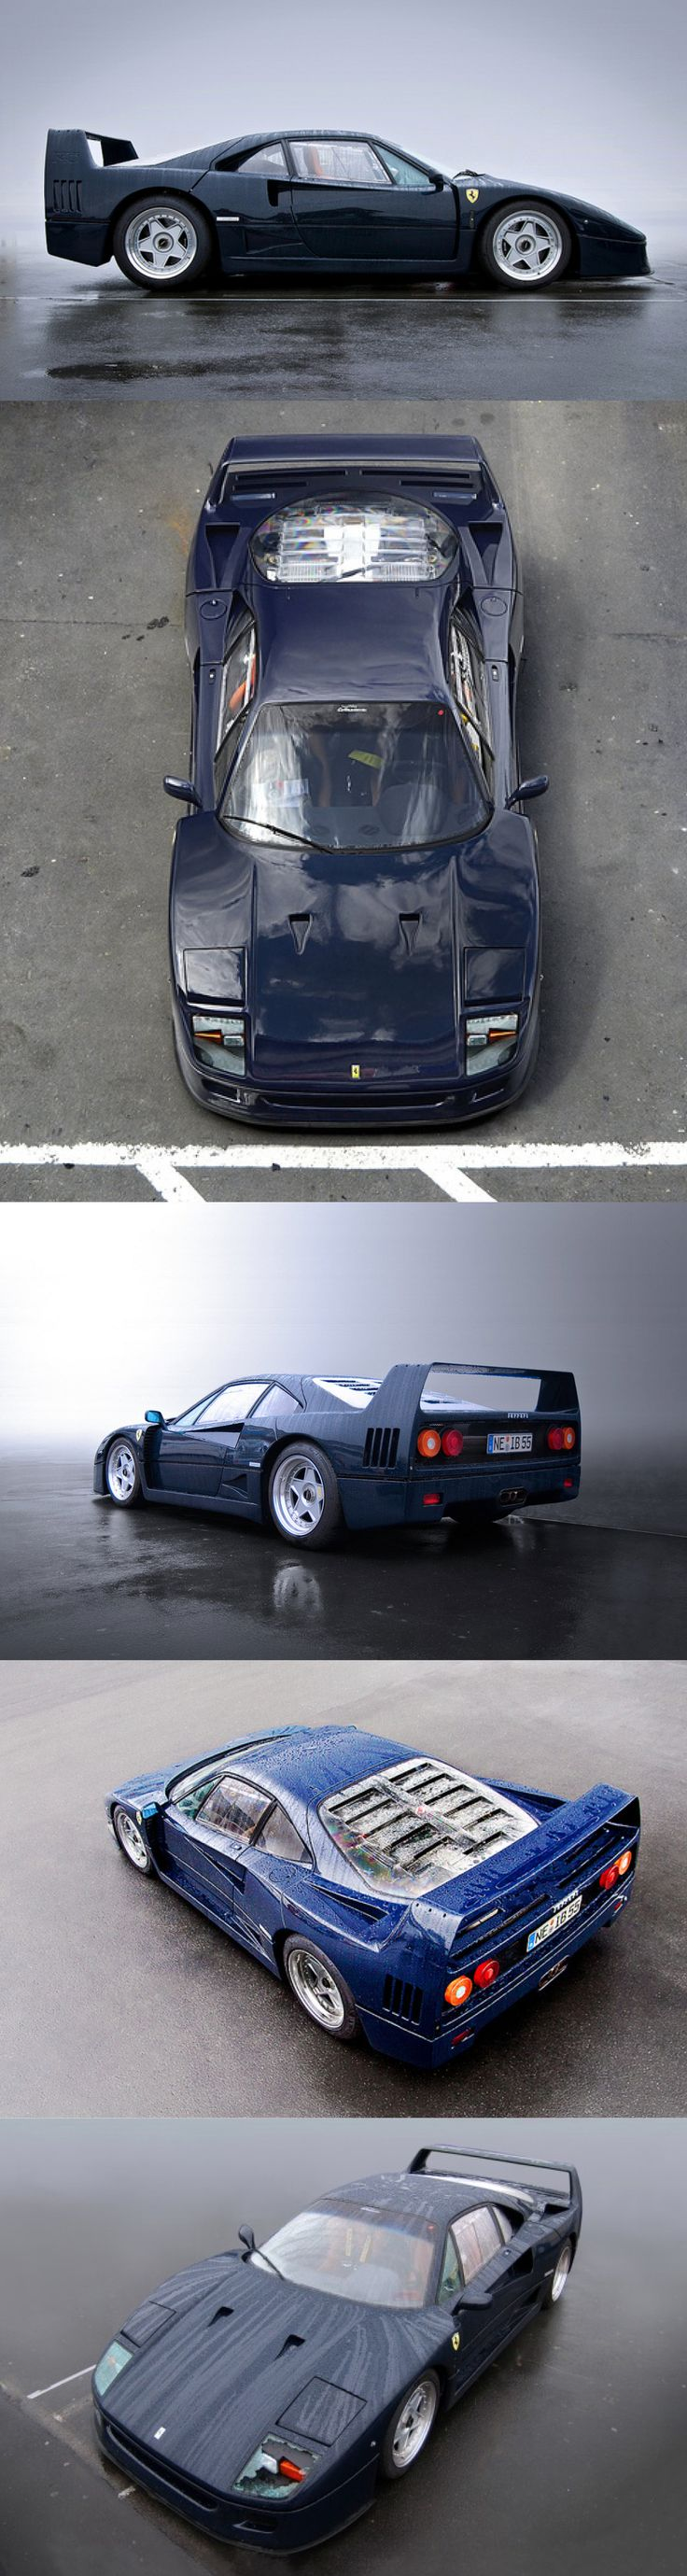 1987 Ferrari F40 / Blu Pozzi / blue / Italy / 17-400